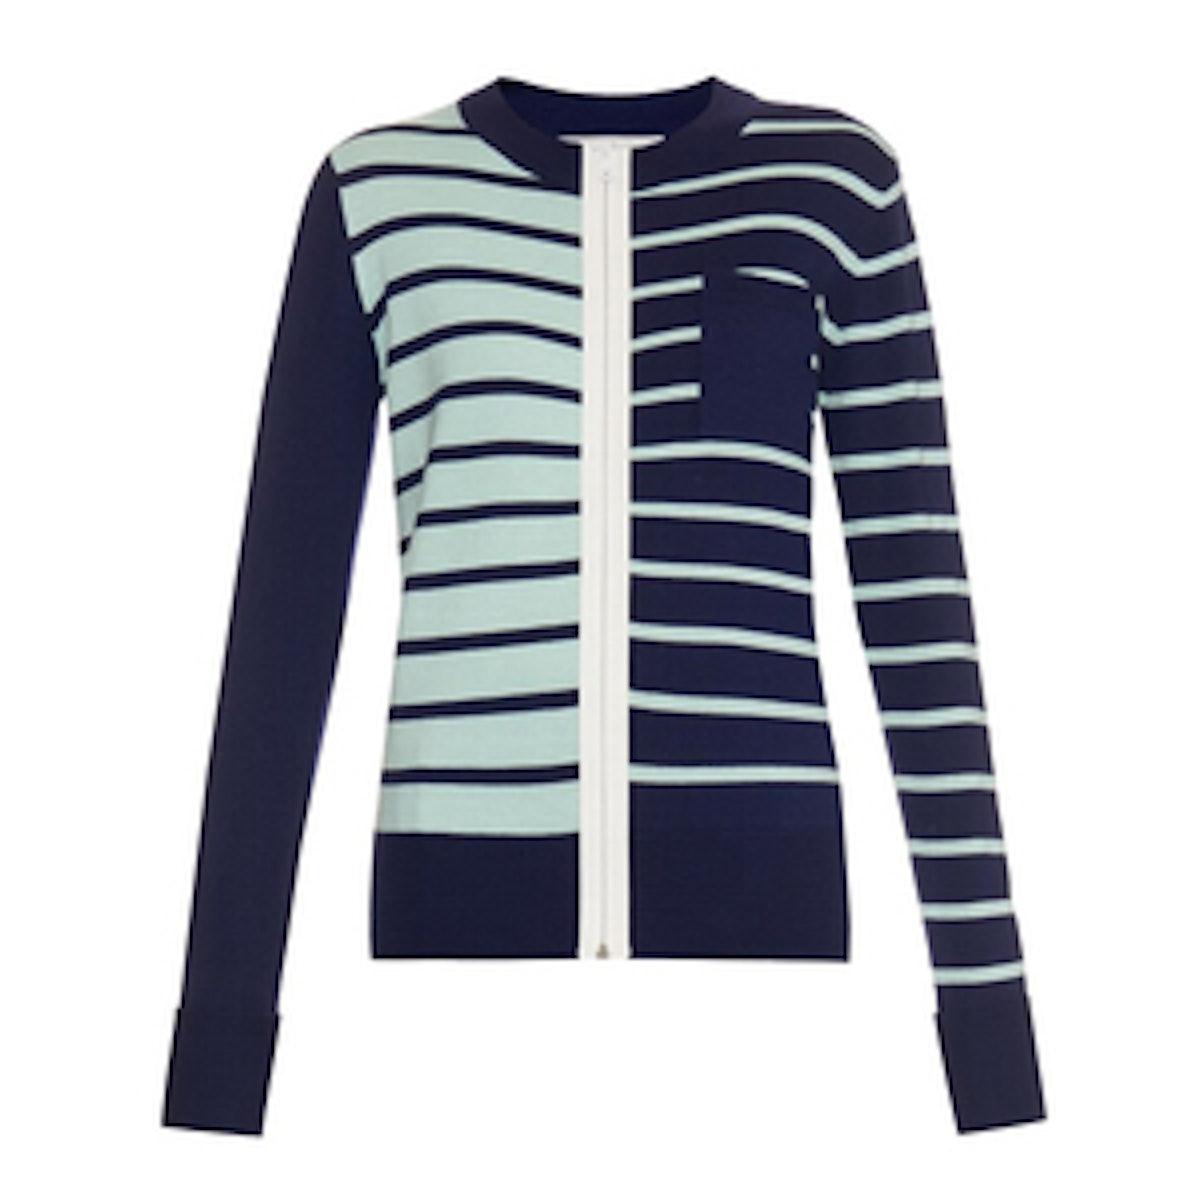 Striped Merino Wool Cardigan